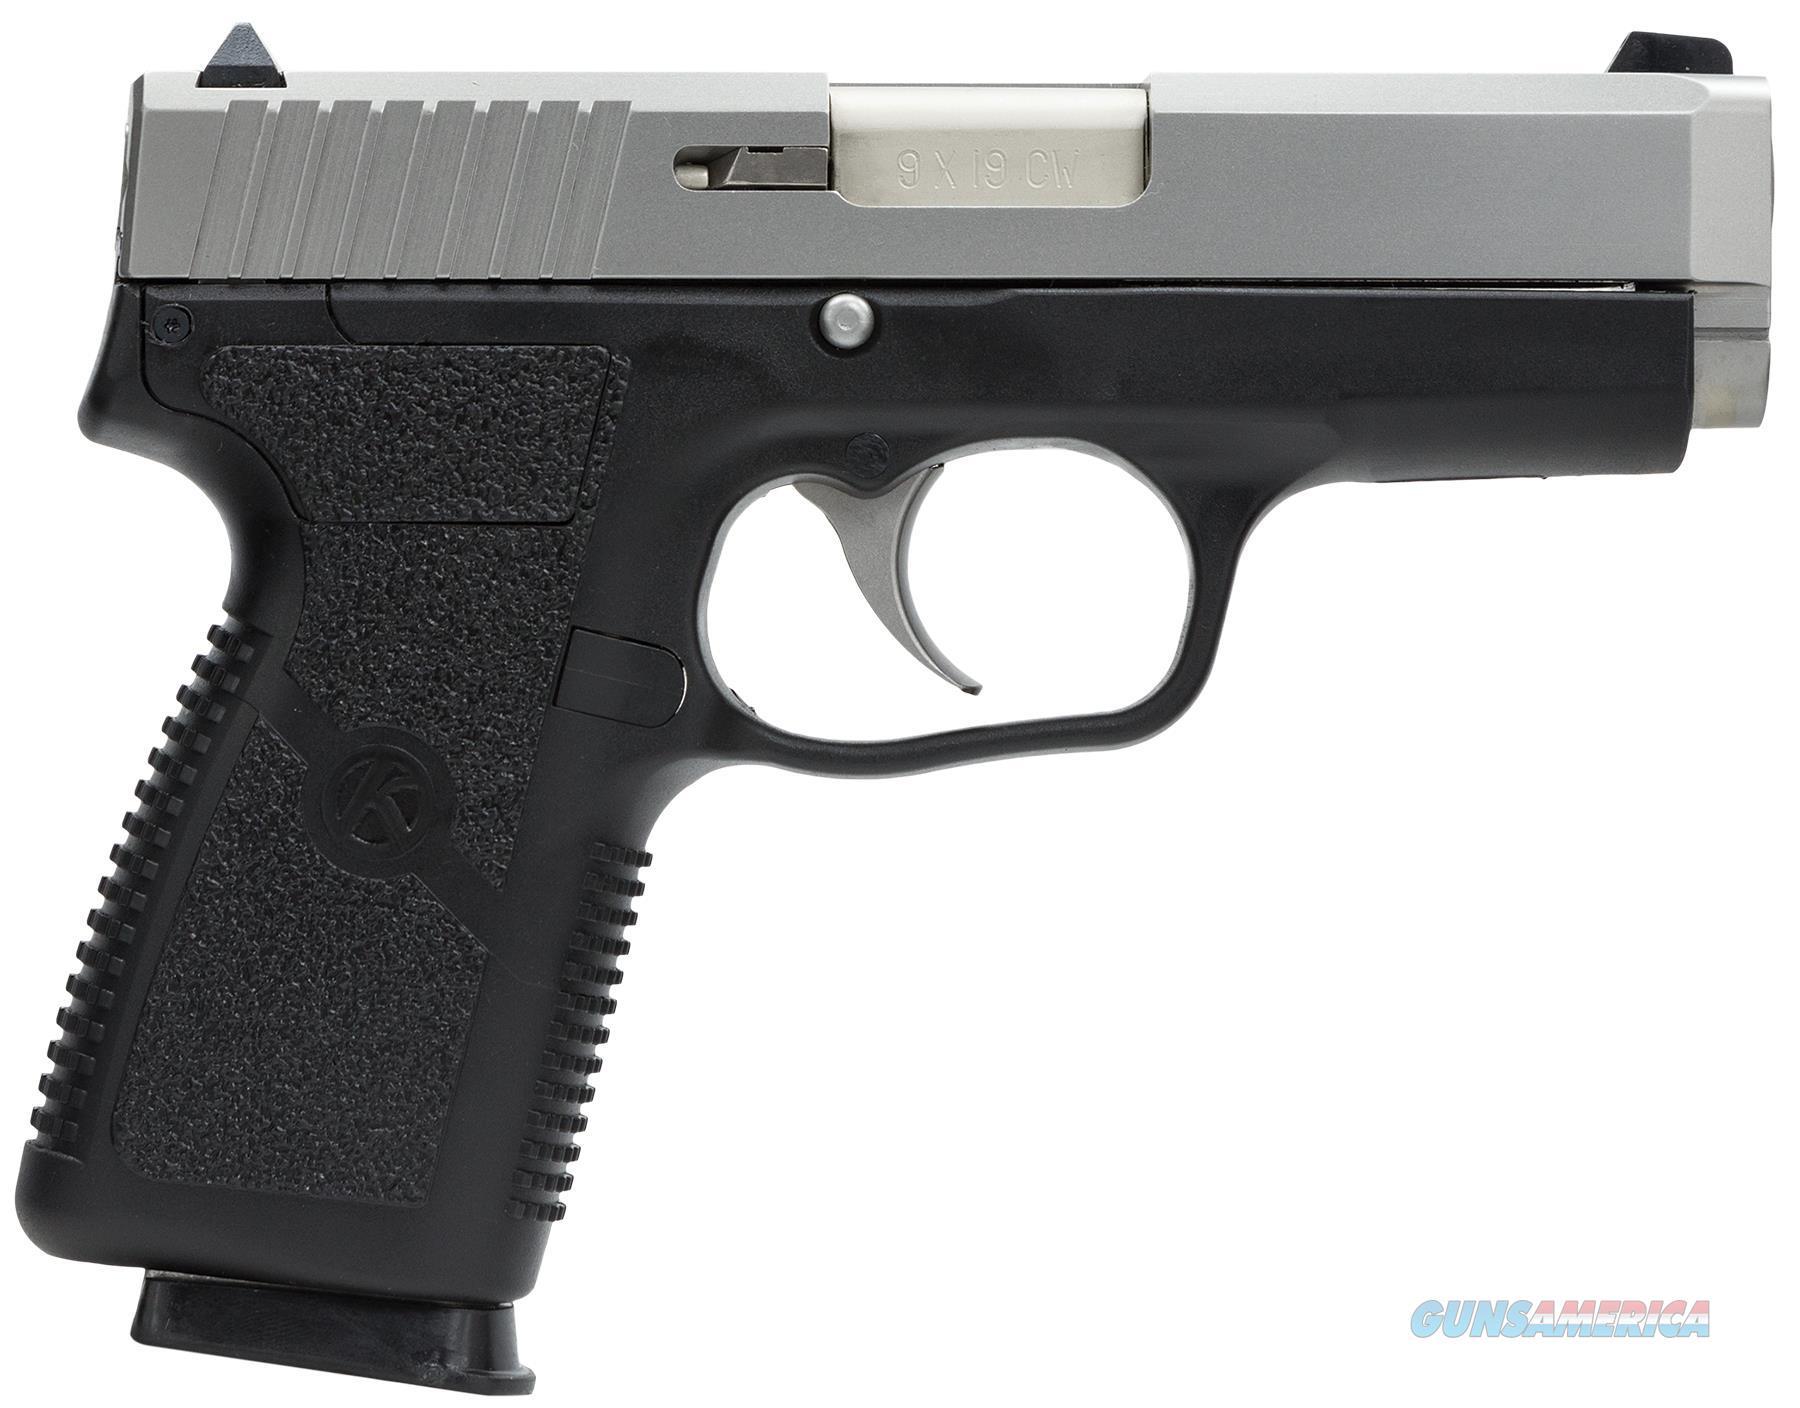 Kahr Arms Cw9 Value Semi Auto Pistol 9Mm, 3.5 In, Poly Grp, 7+1 Rnd, Compact Blk Frame CW9093  Guns > Pistols > K Misc Pistols